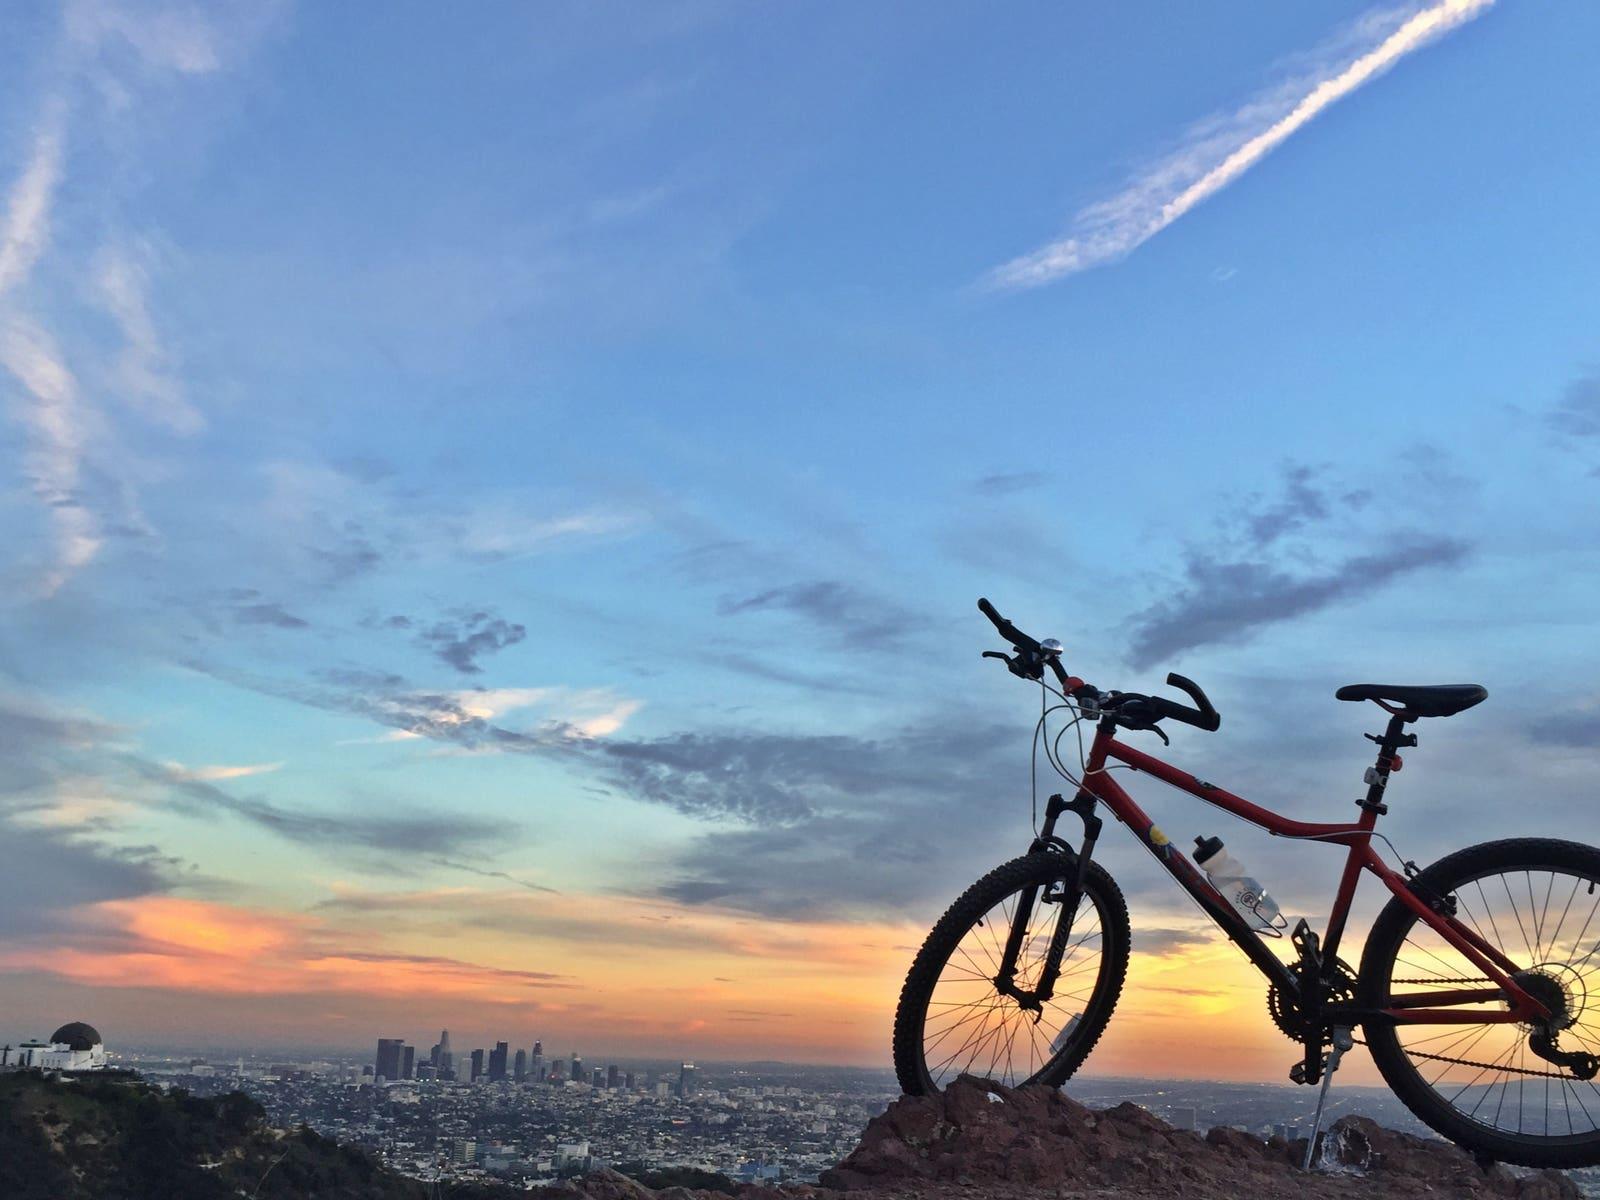 Griffith Park at sunset   |  Photo: Joshua Johnson